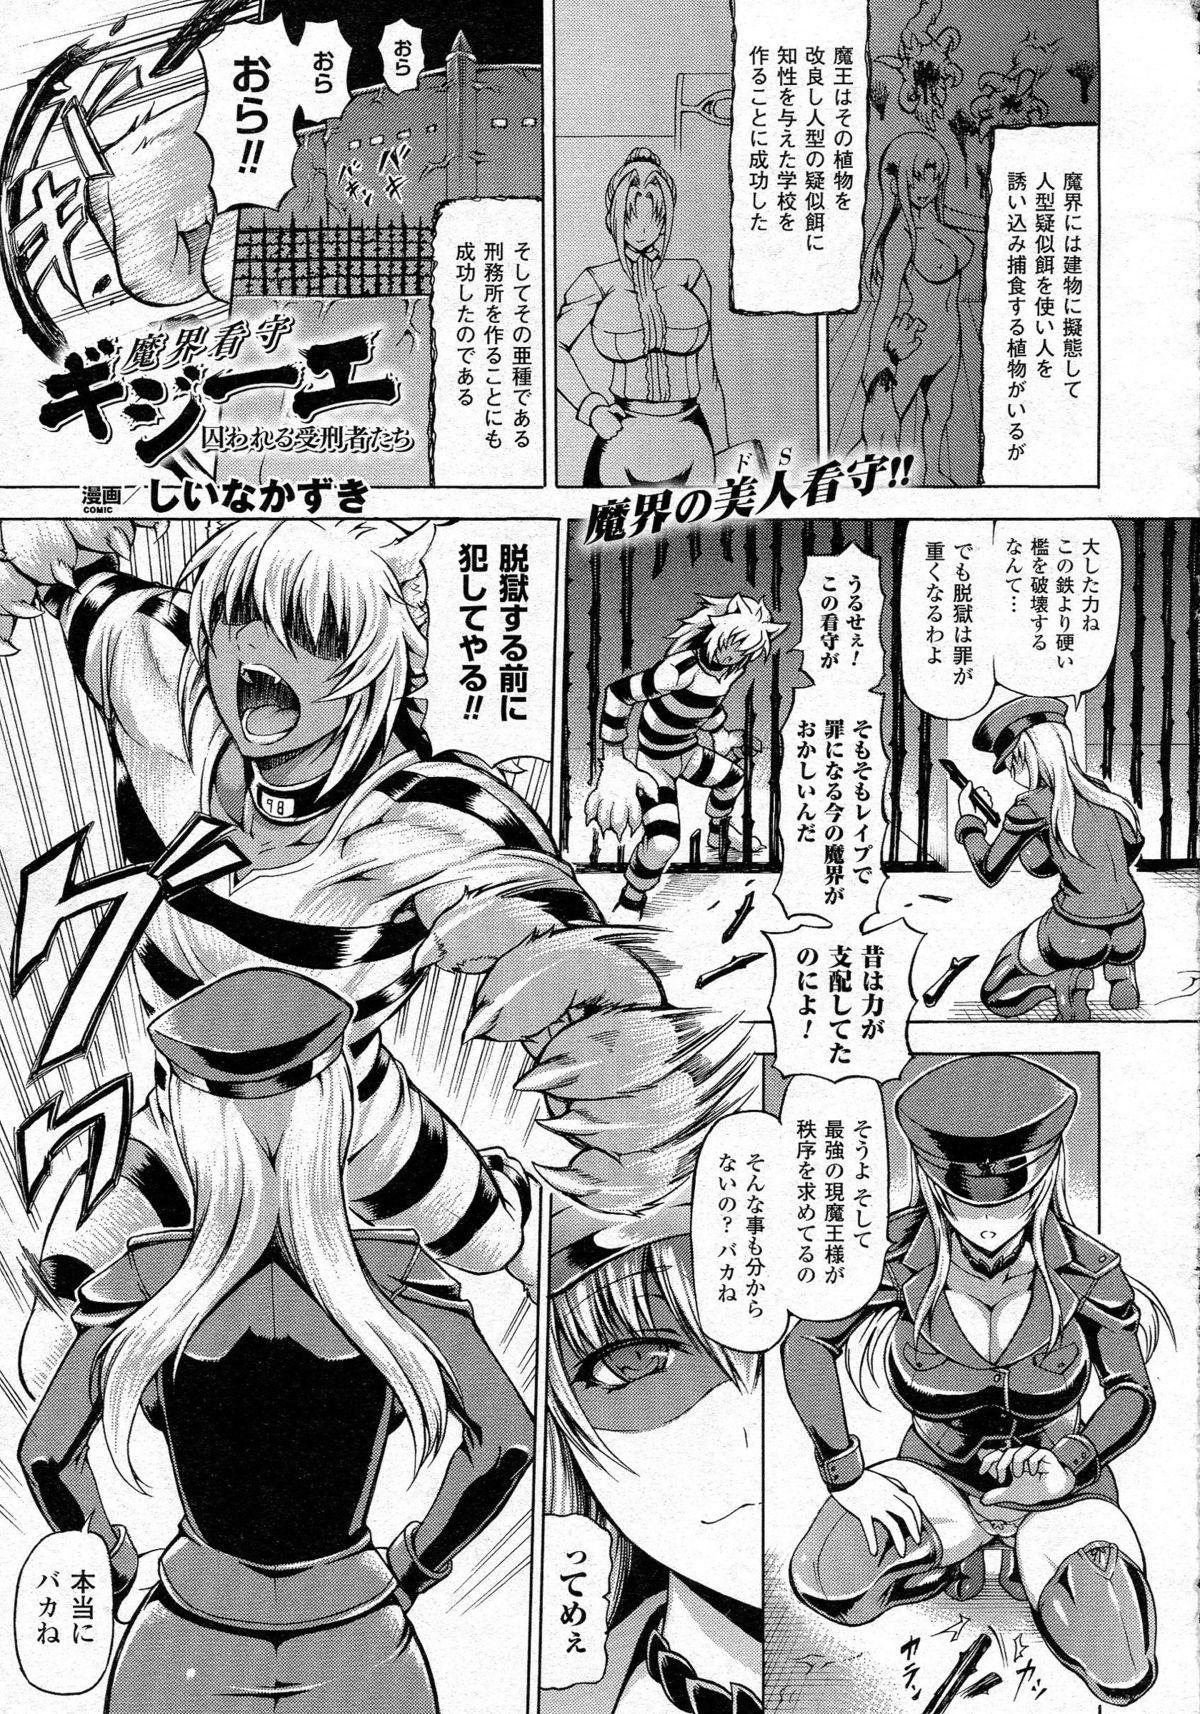 COMIC Unreal 2015-06 Vol. 55 + Hisasi Illust Shuu 133